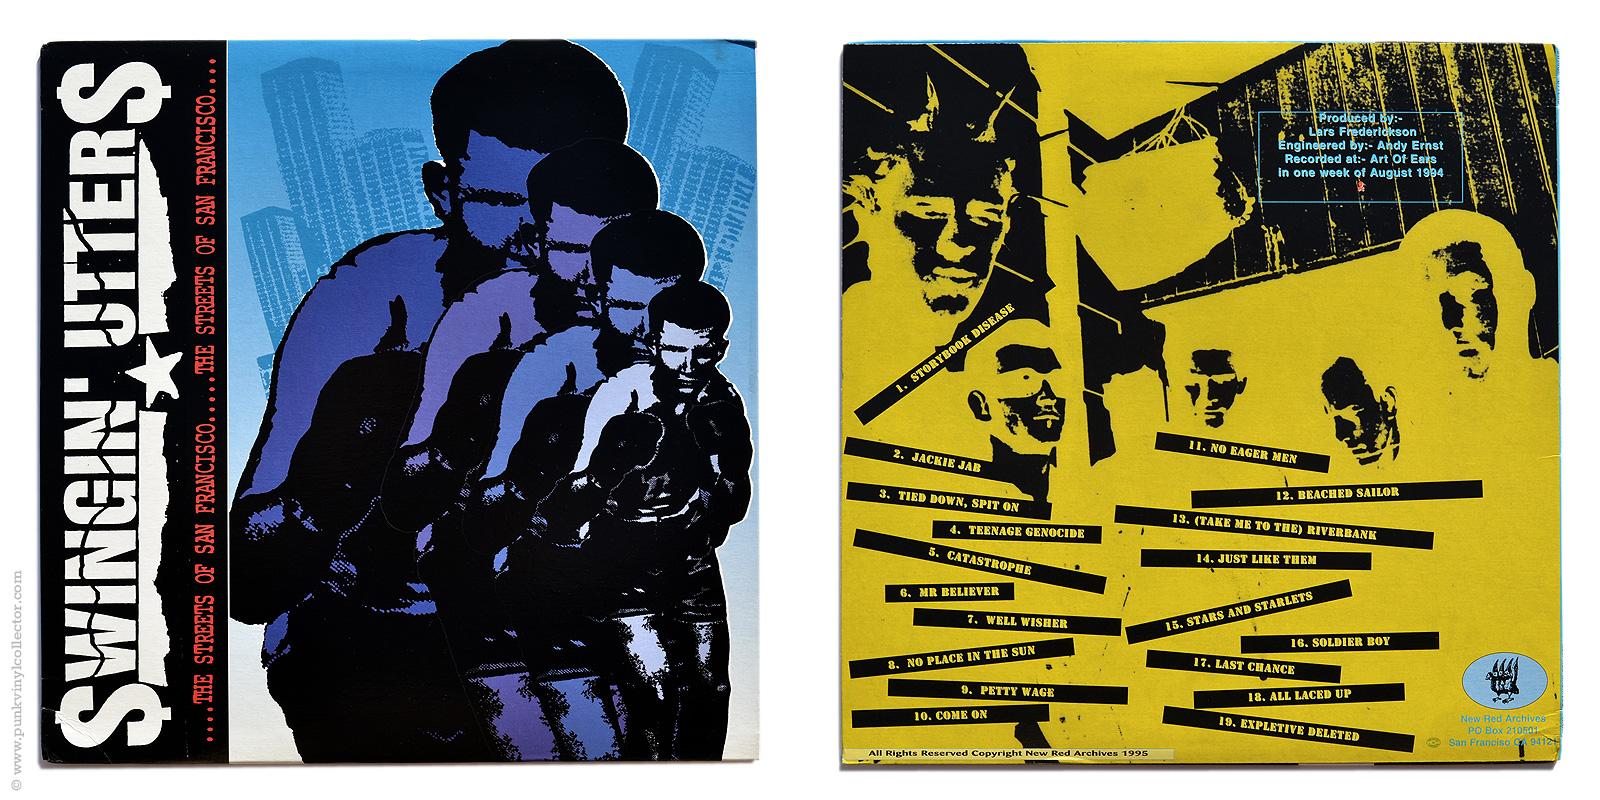 Swingin Utters Punk Vinyl Collector